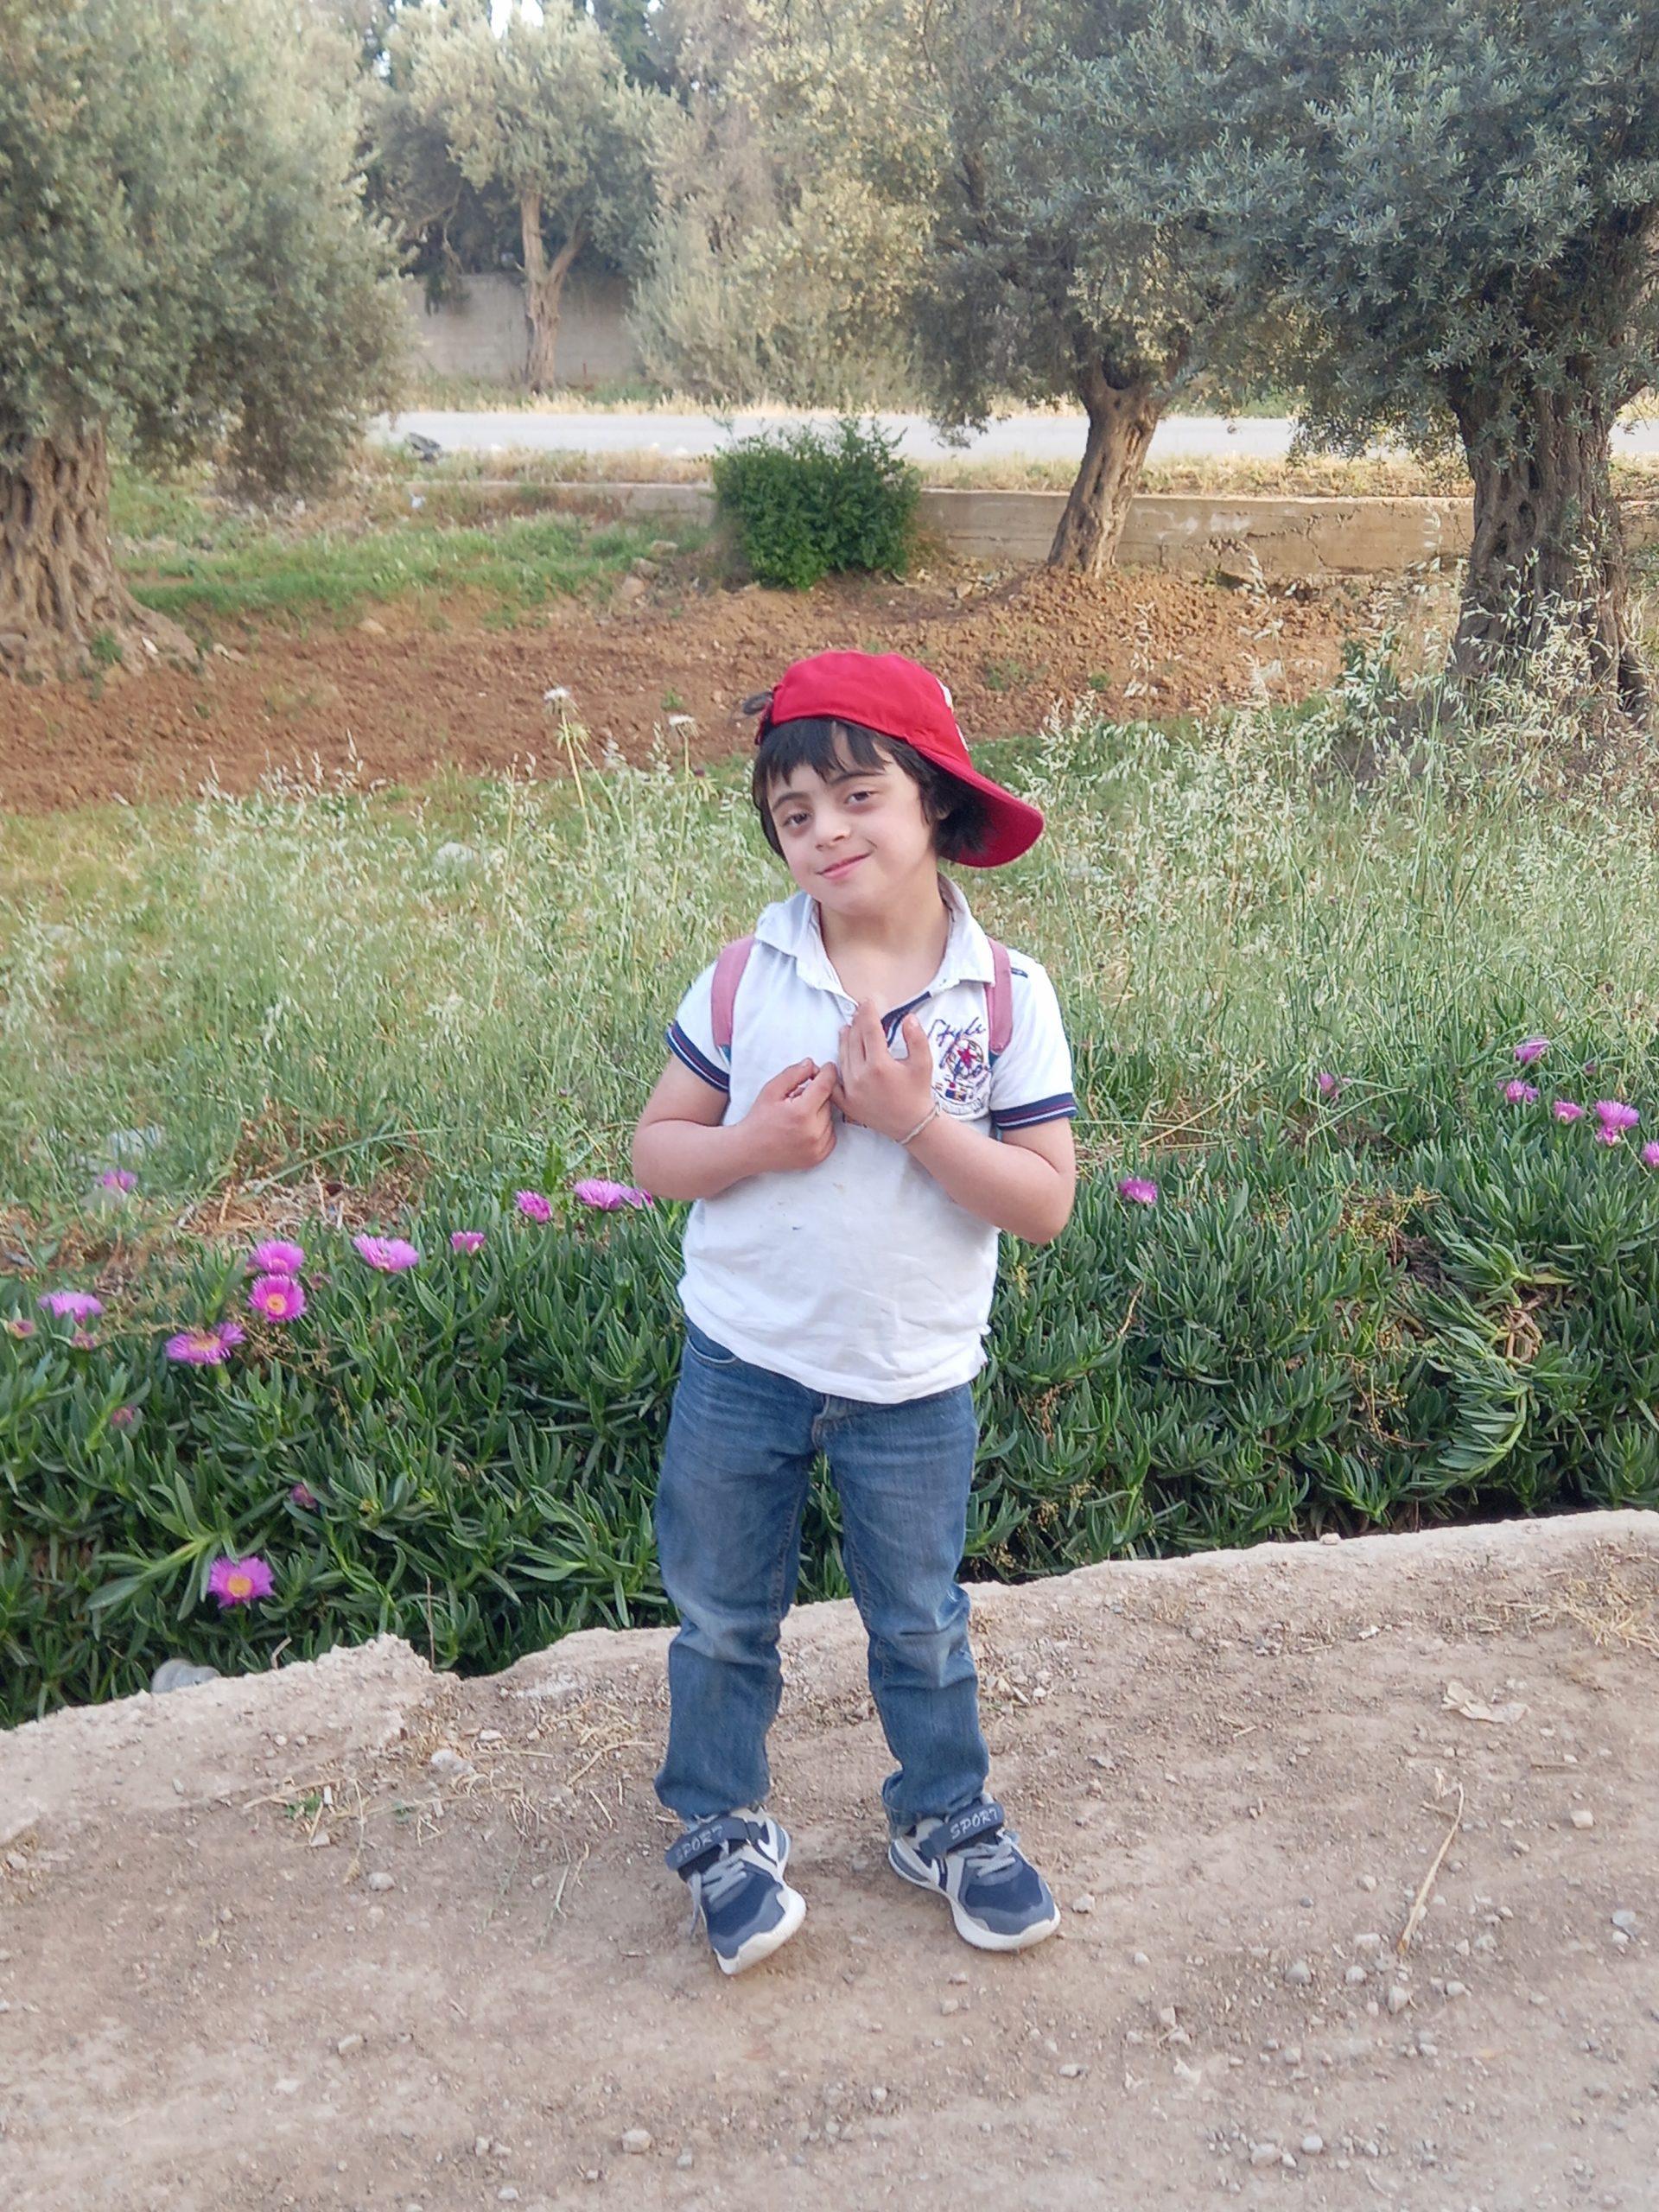 Son of Rehab Malouf